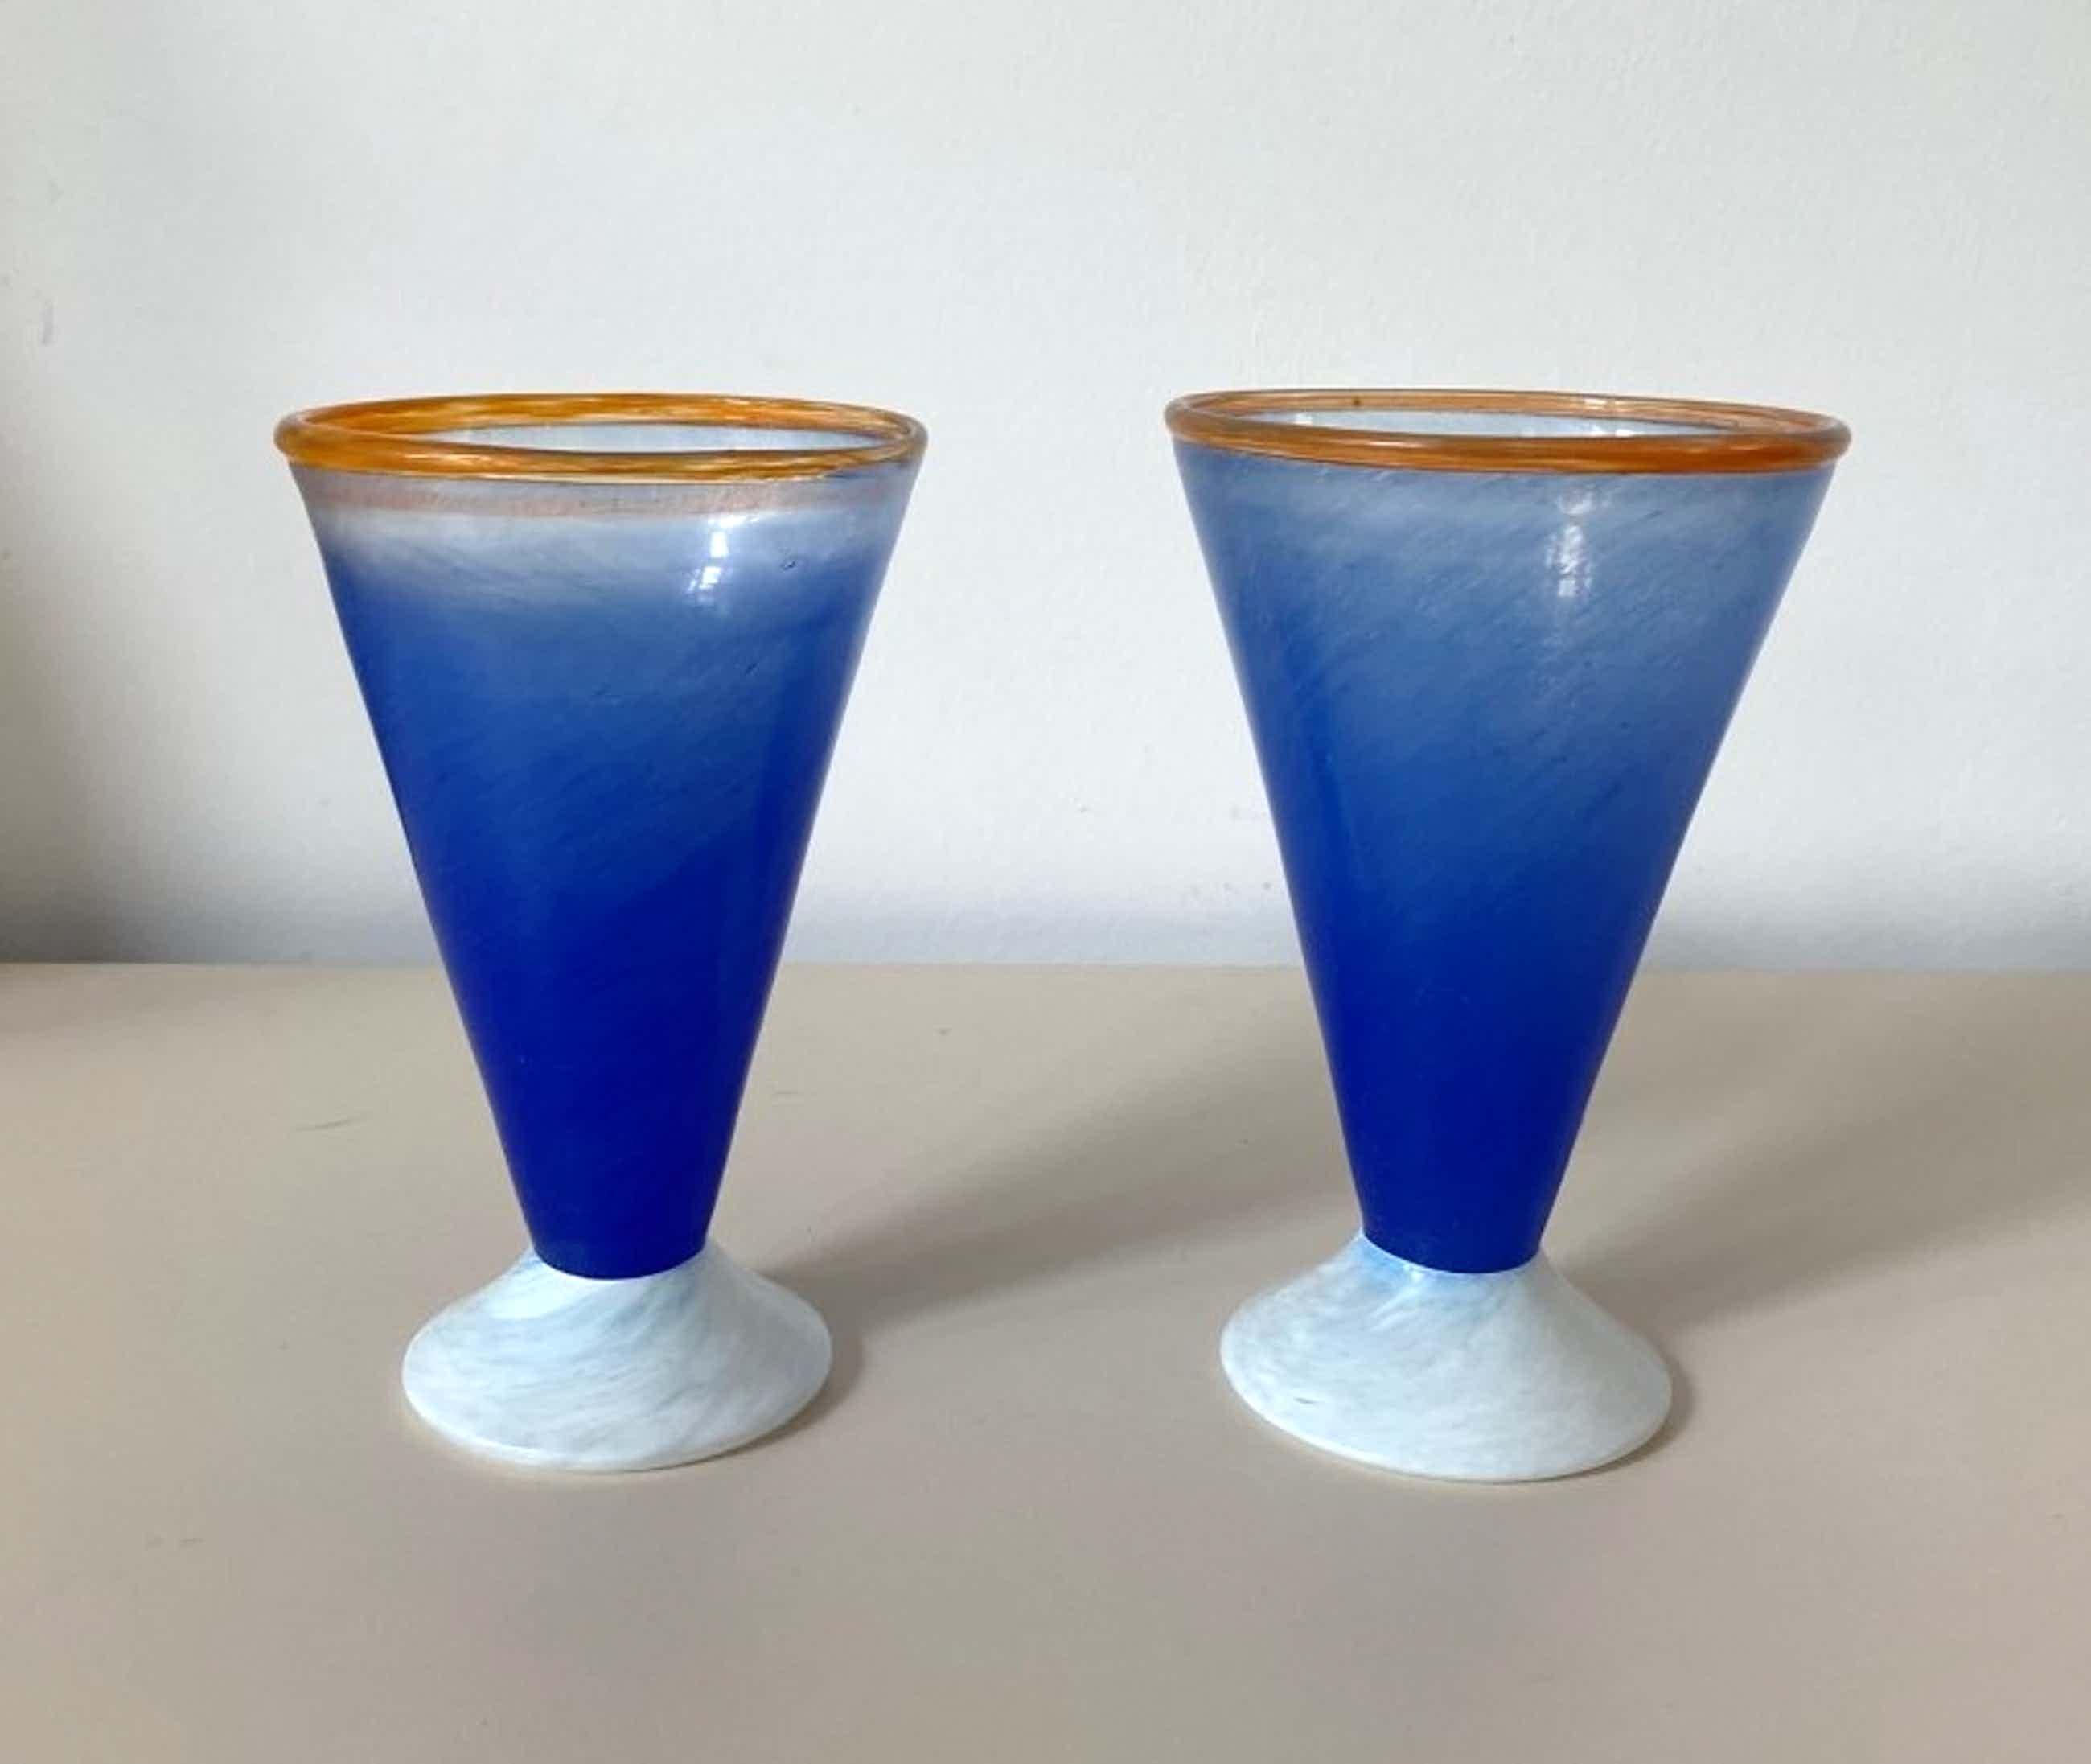 Niet of onleesbaar gesigneerd - Jema Boda Glasbruk - twee gekleurde vaasjes - A. Gray kopen? Bied vanaf 1!